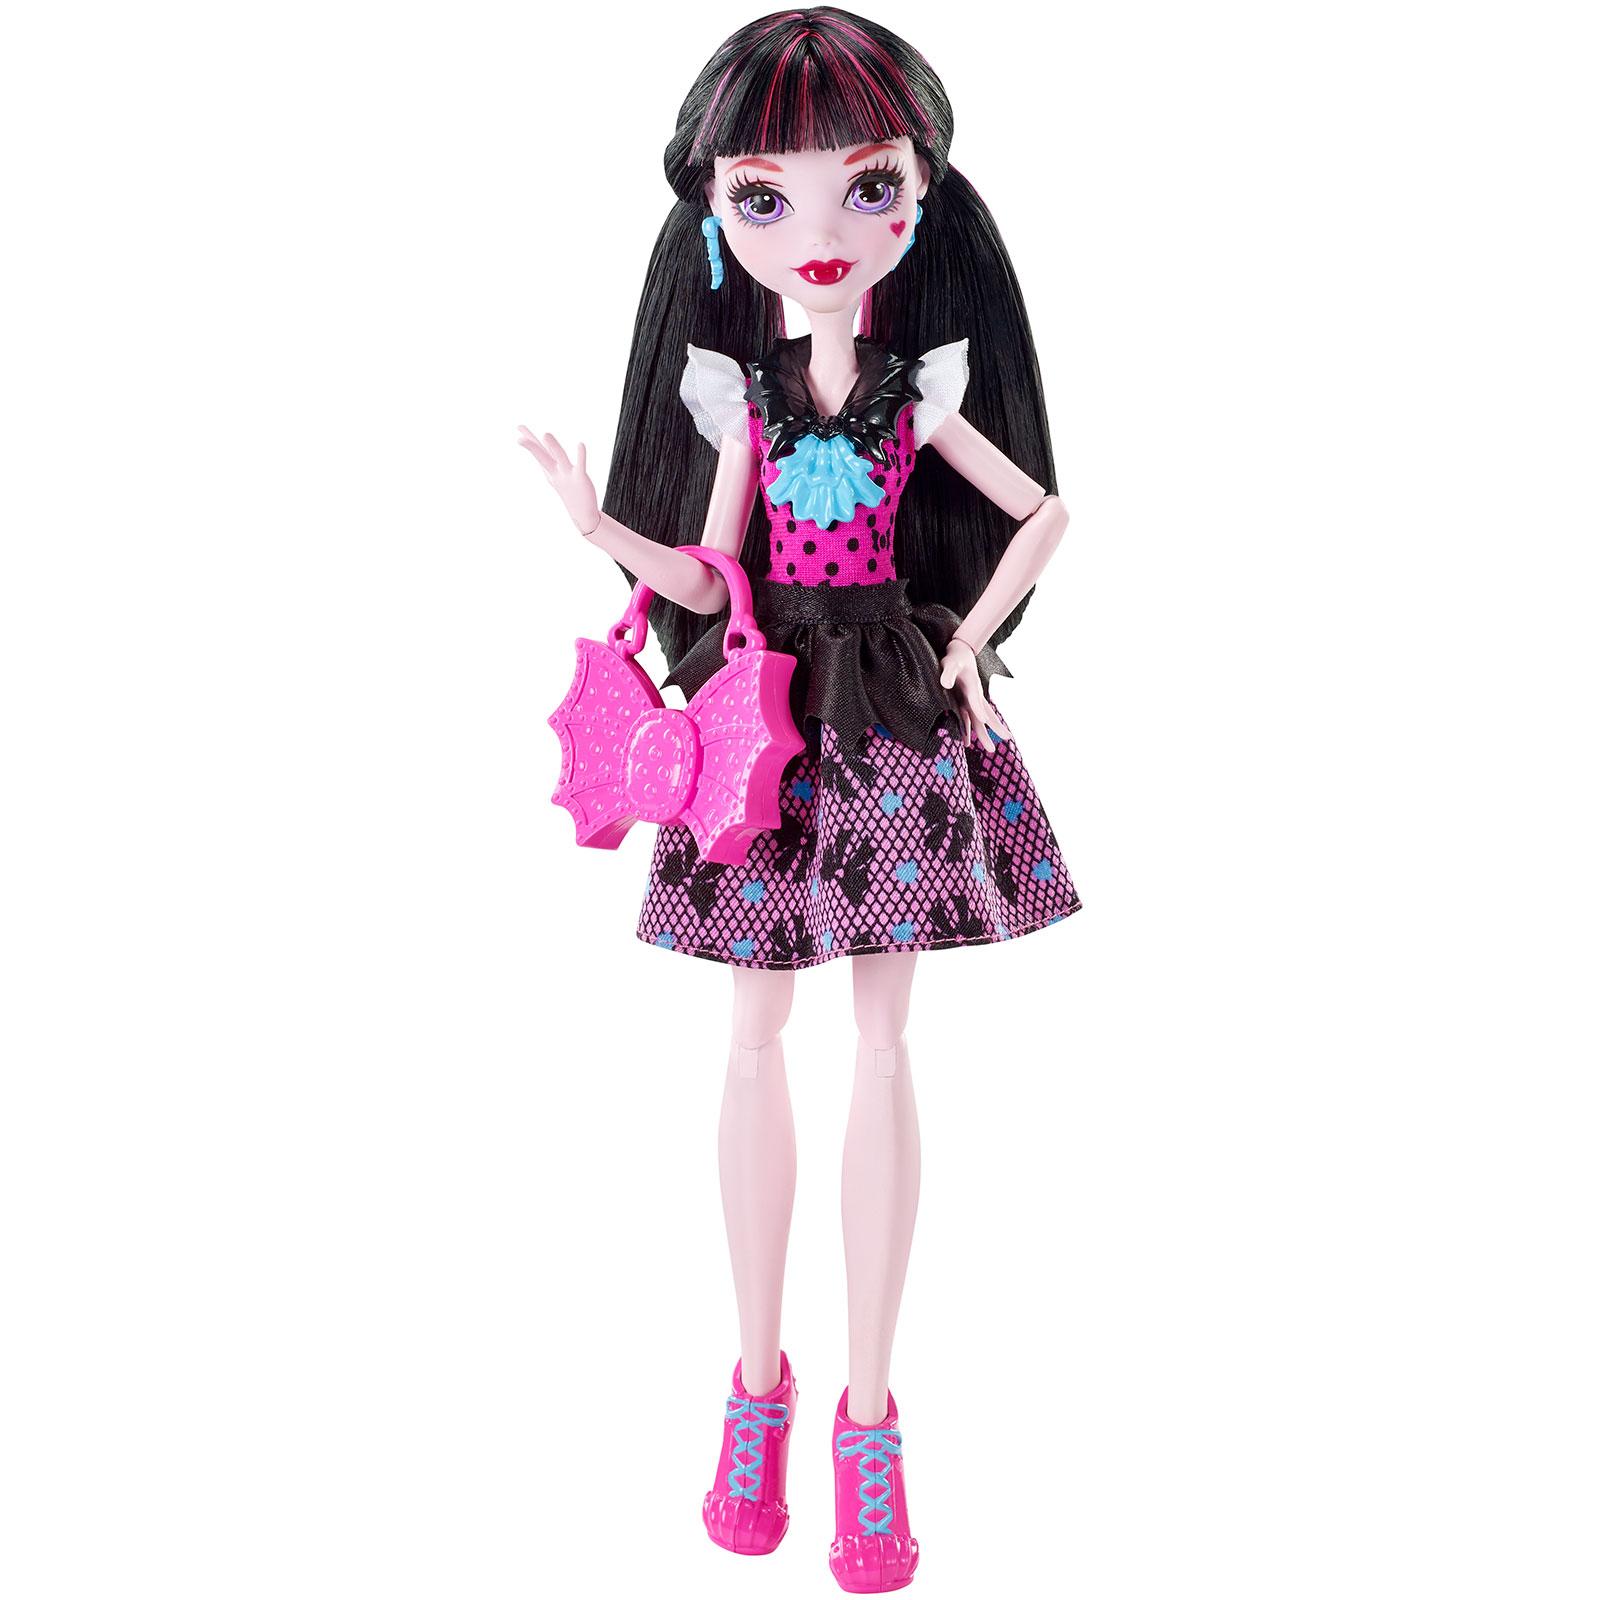 Mattel Girls Monster High Daughter of Dracula Doll - Draculaura PartNumber: 004W009103129001P